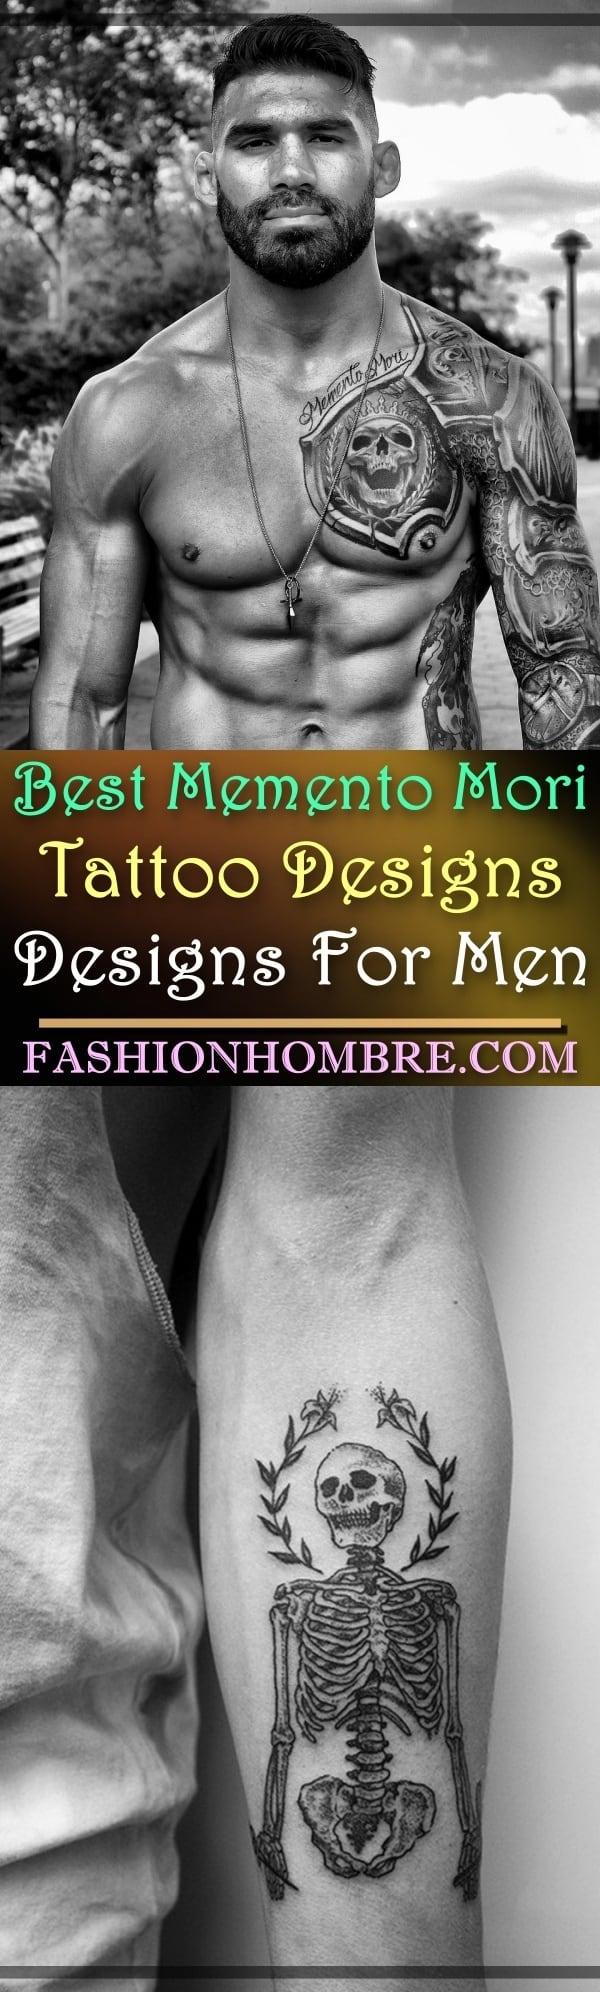 Best Memento Mori Tattoo Designs For Men